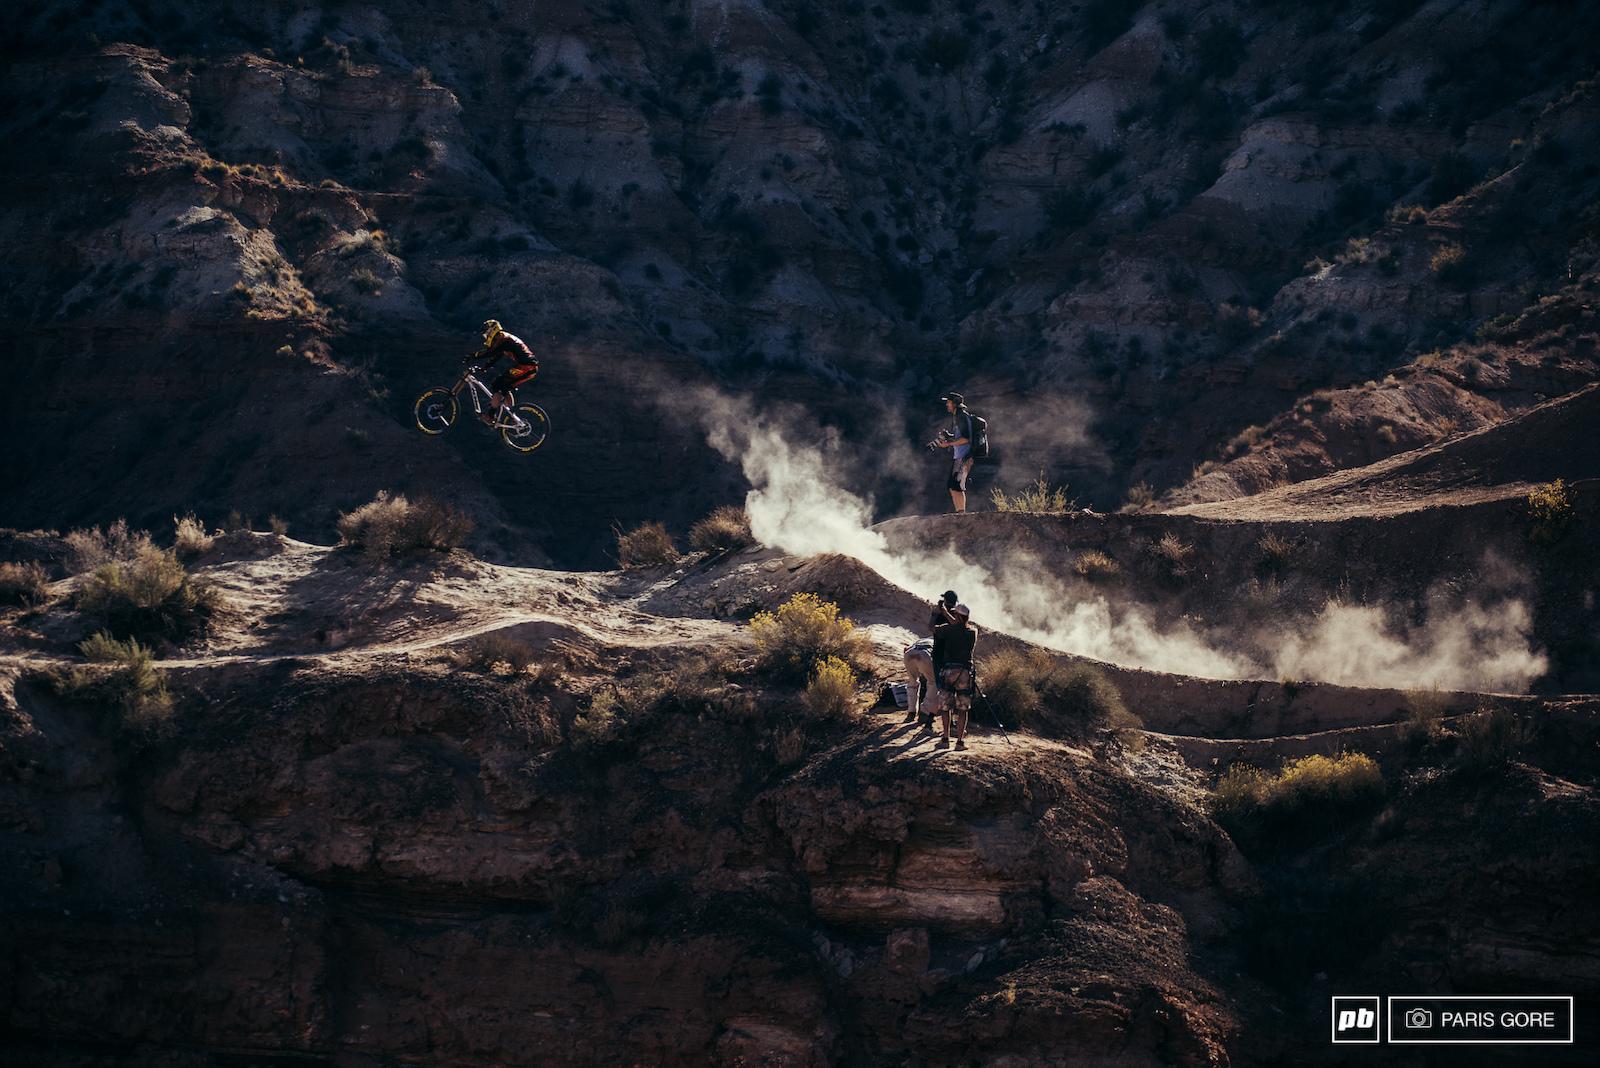 Logan Binggeli narrowly escaping the dust trails.